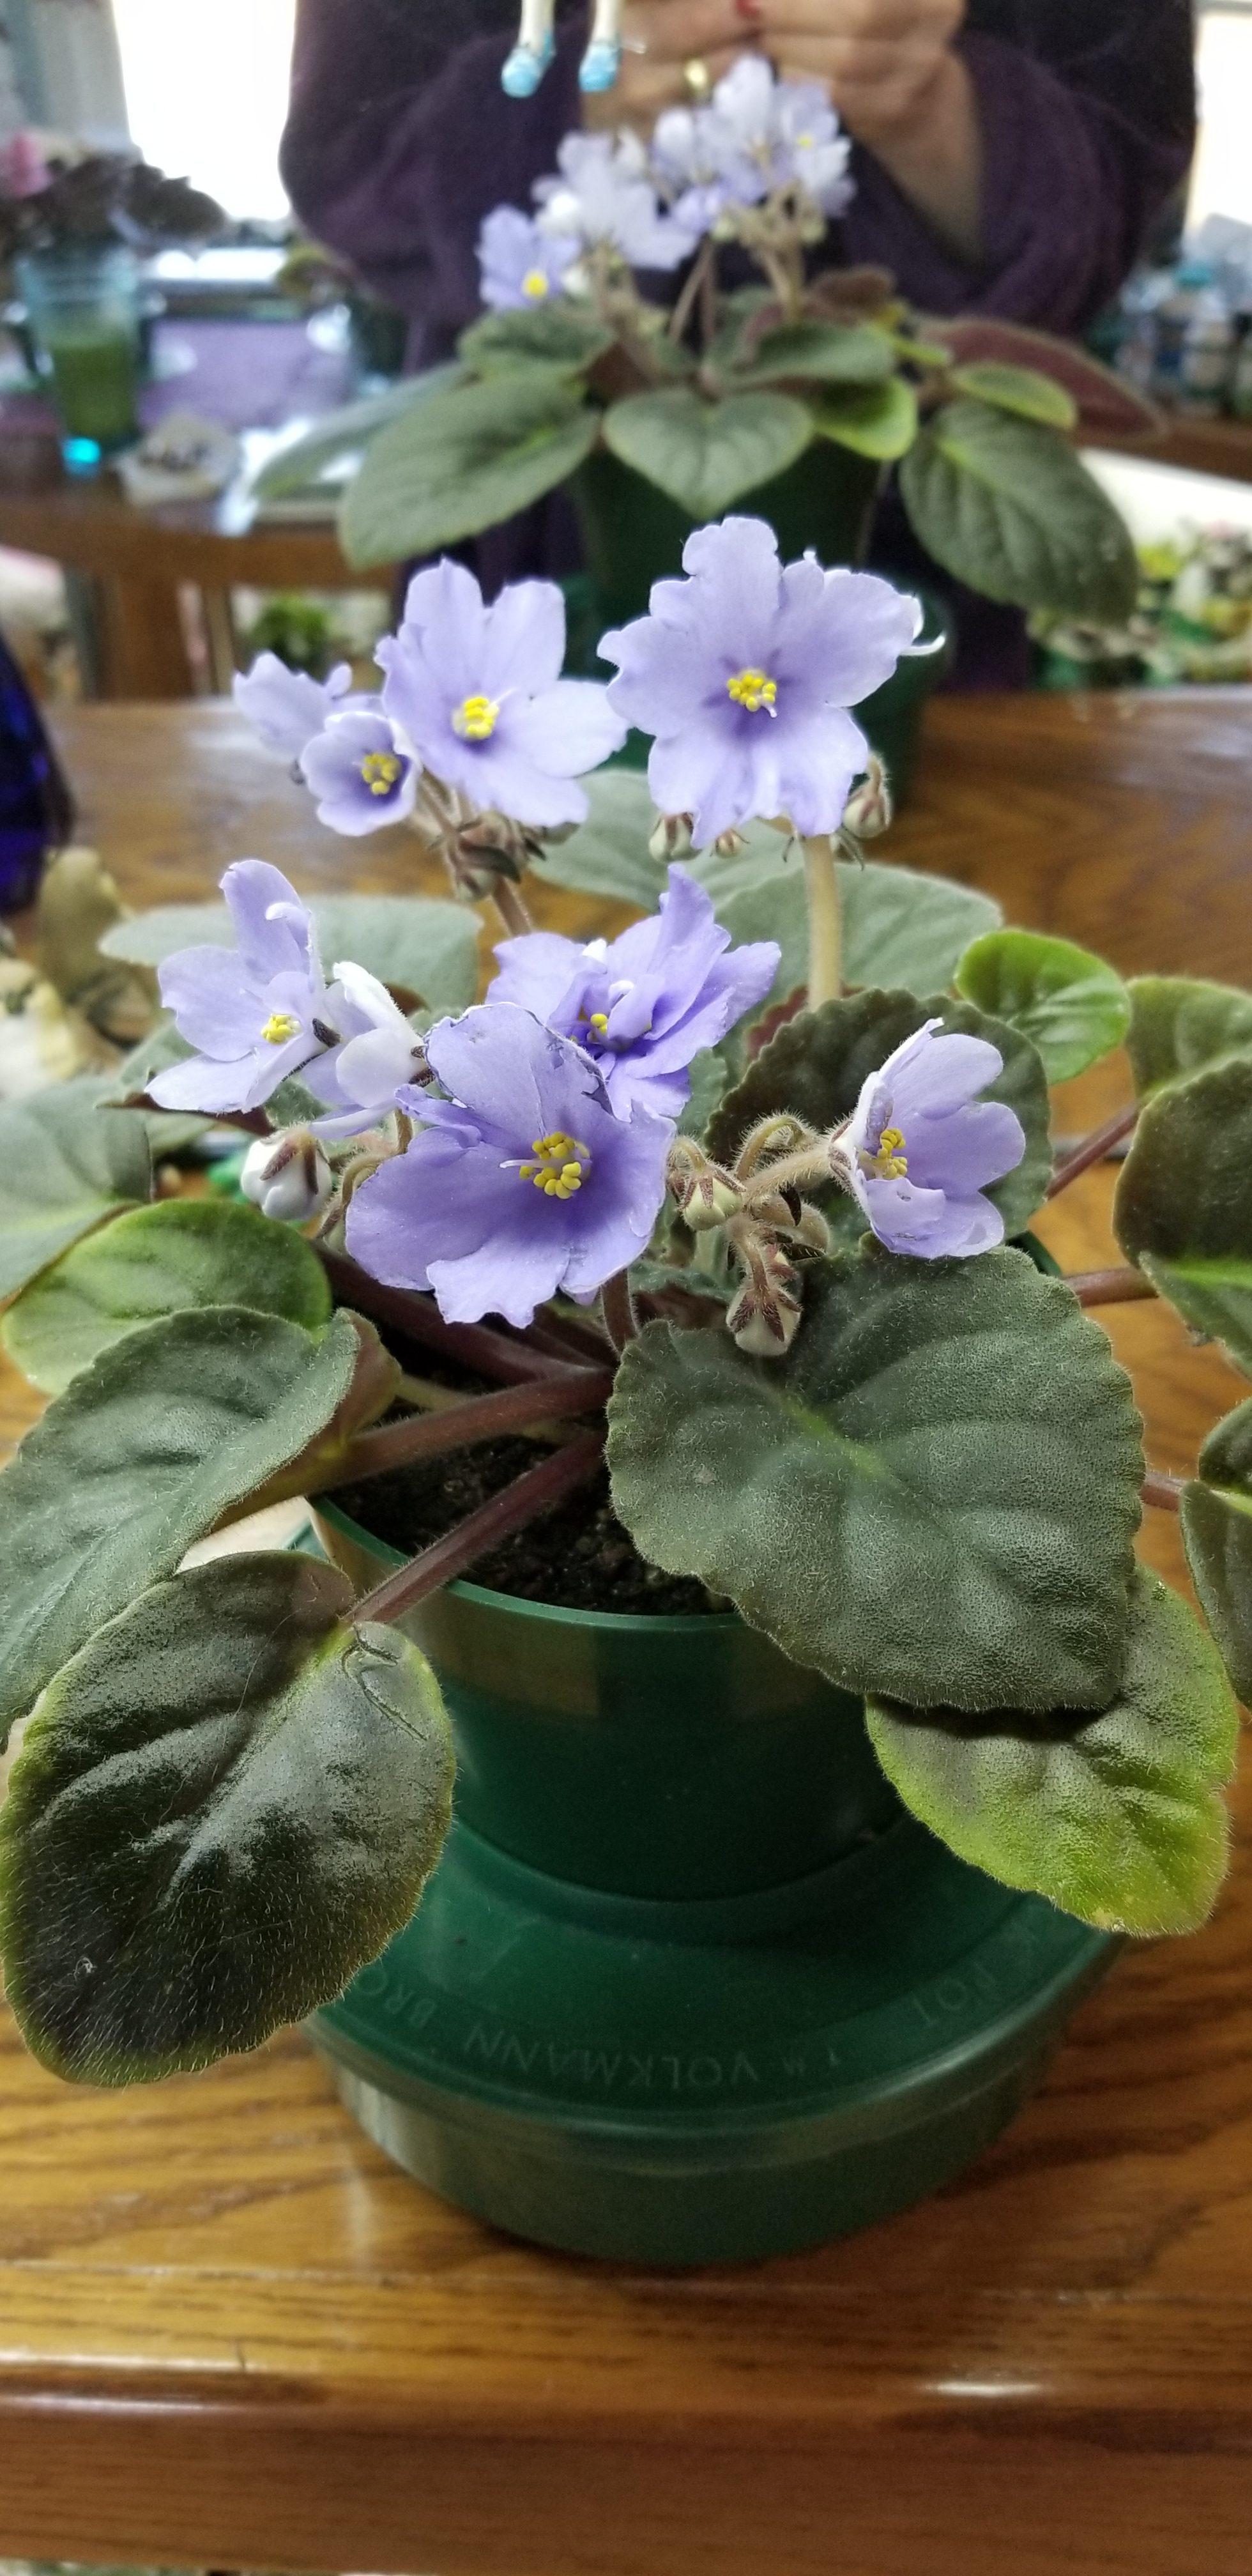 "Large standard Semi-double periwinkle light blue flowers, stem has 3-5 blooms, 1.75"" bloom dia, foliage quilted flat, Hybridizer Granger's Egerdom, 1978"